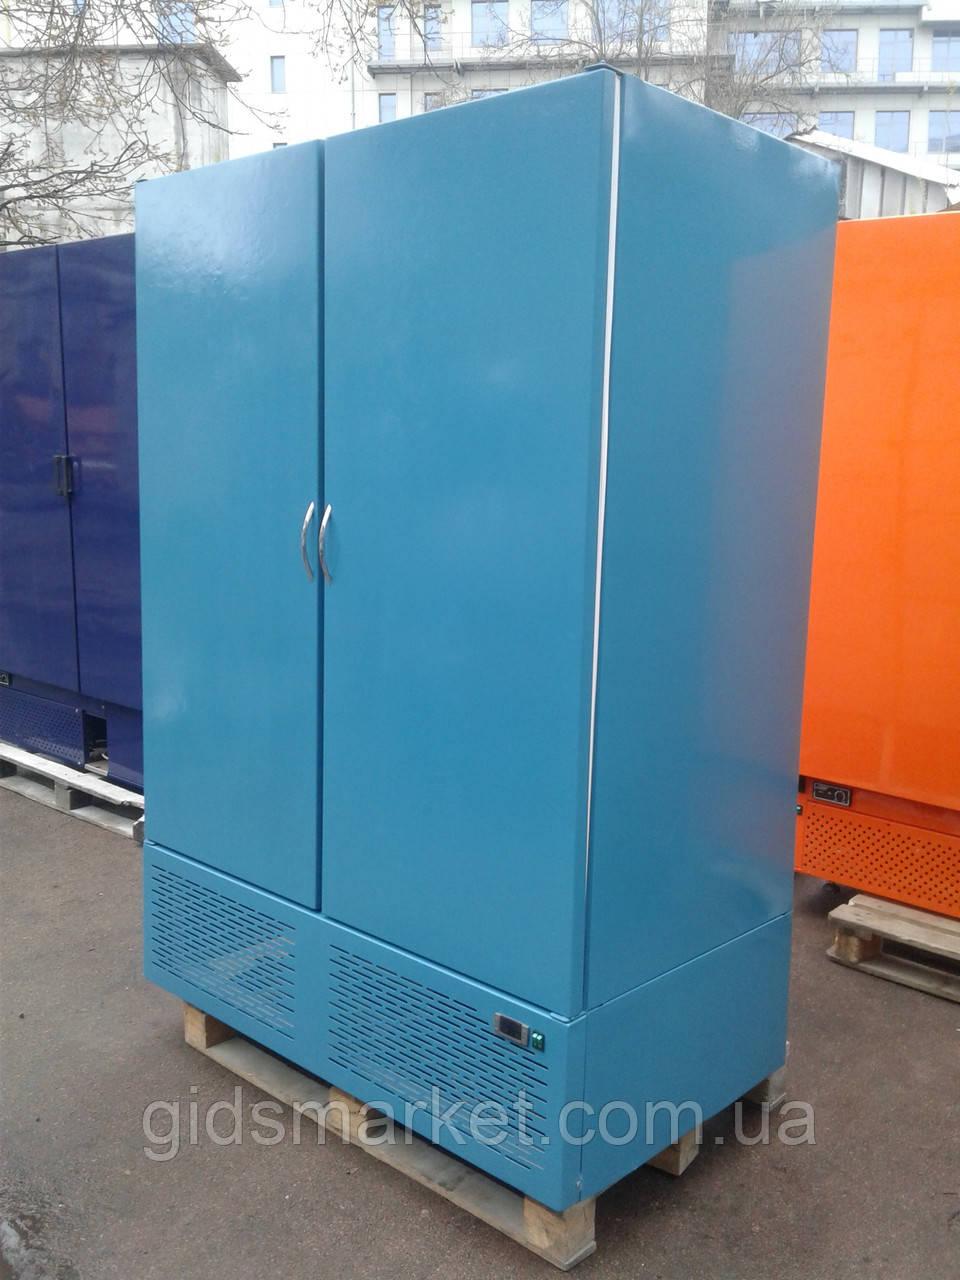 Холодильник производства ТехноХолод б\у Украина